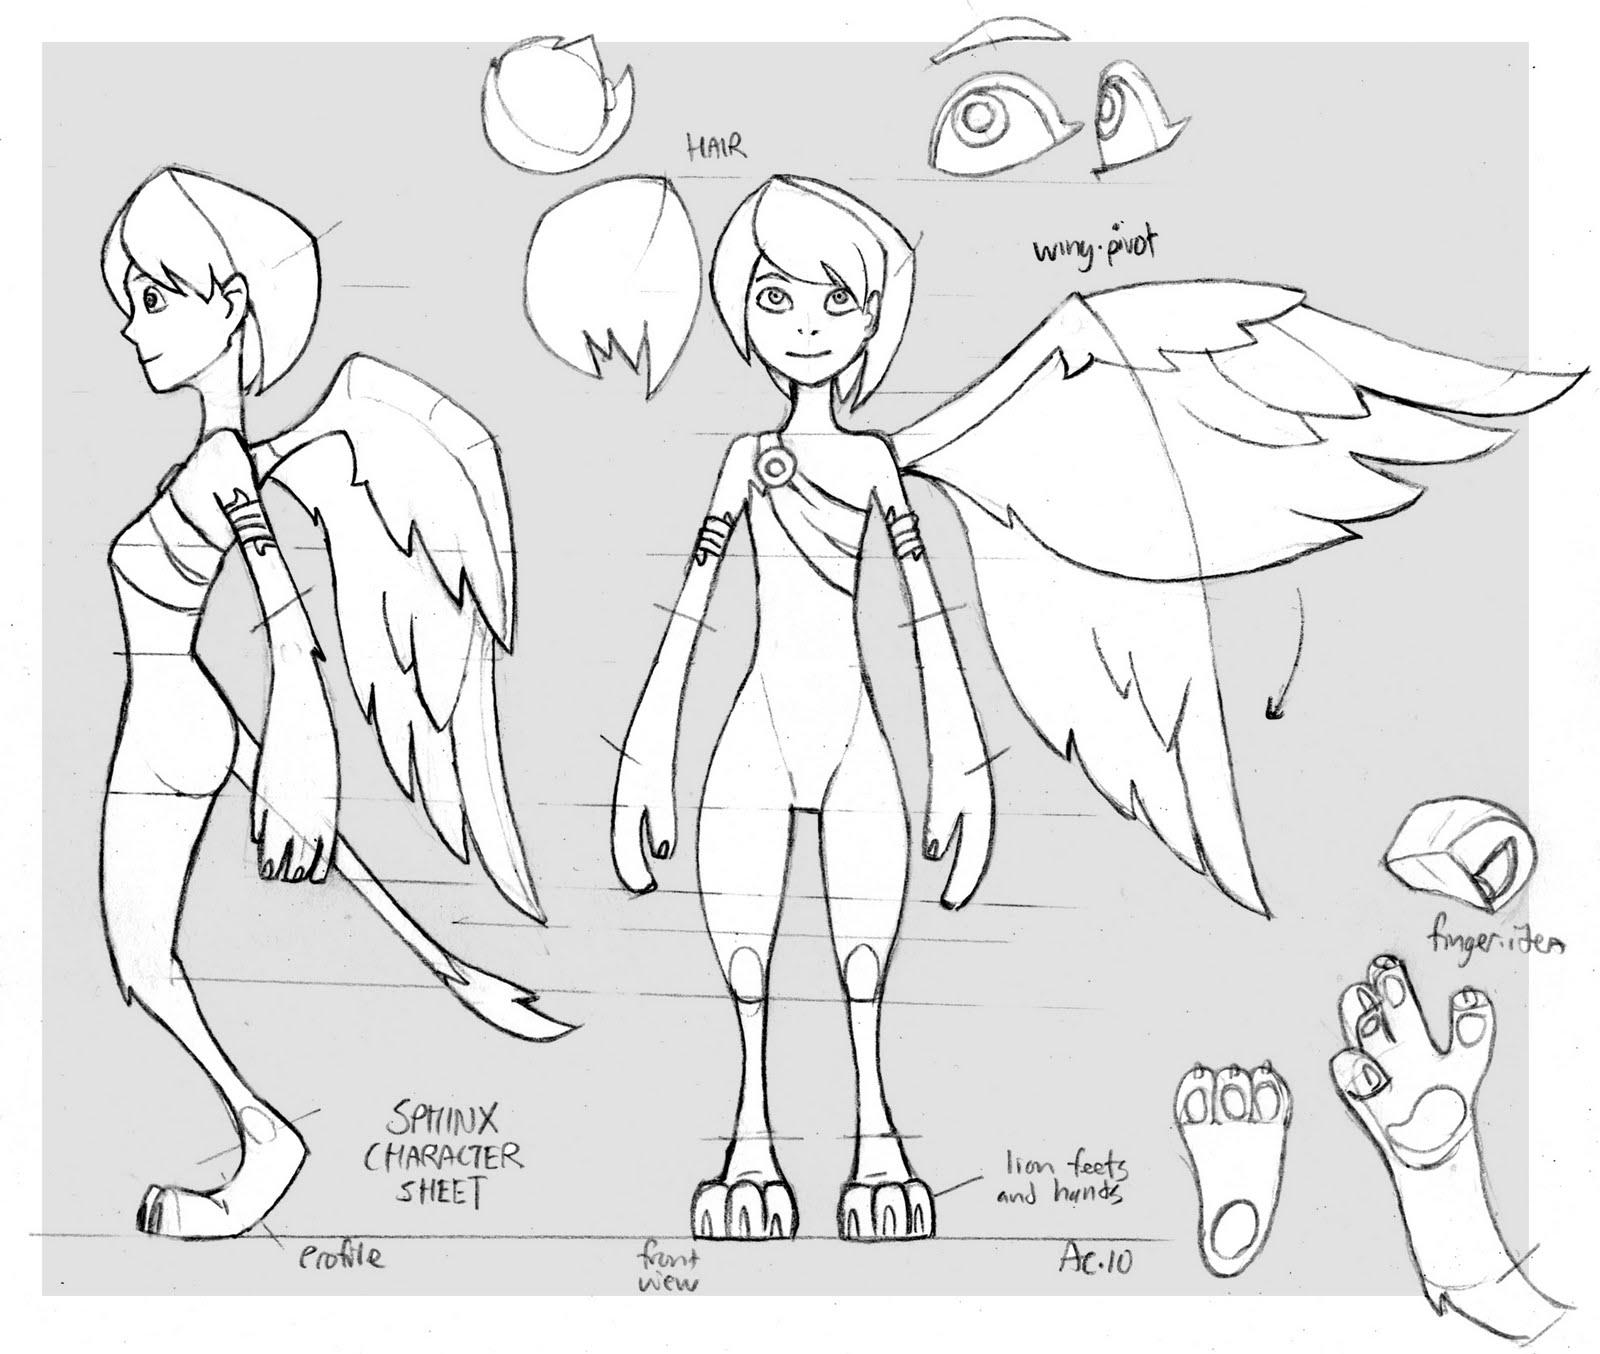 character design post - photo #31